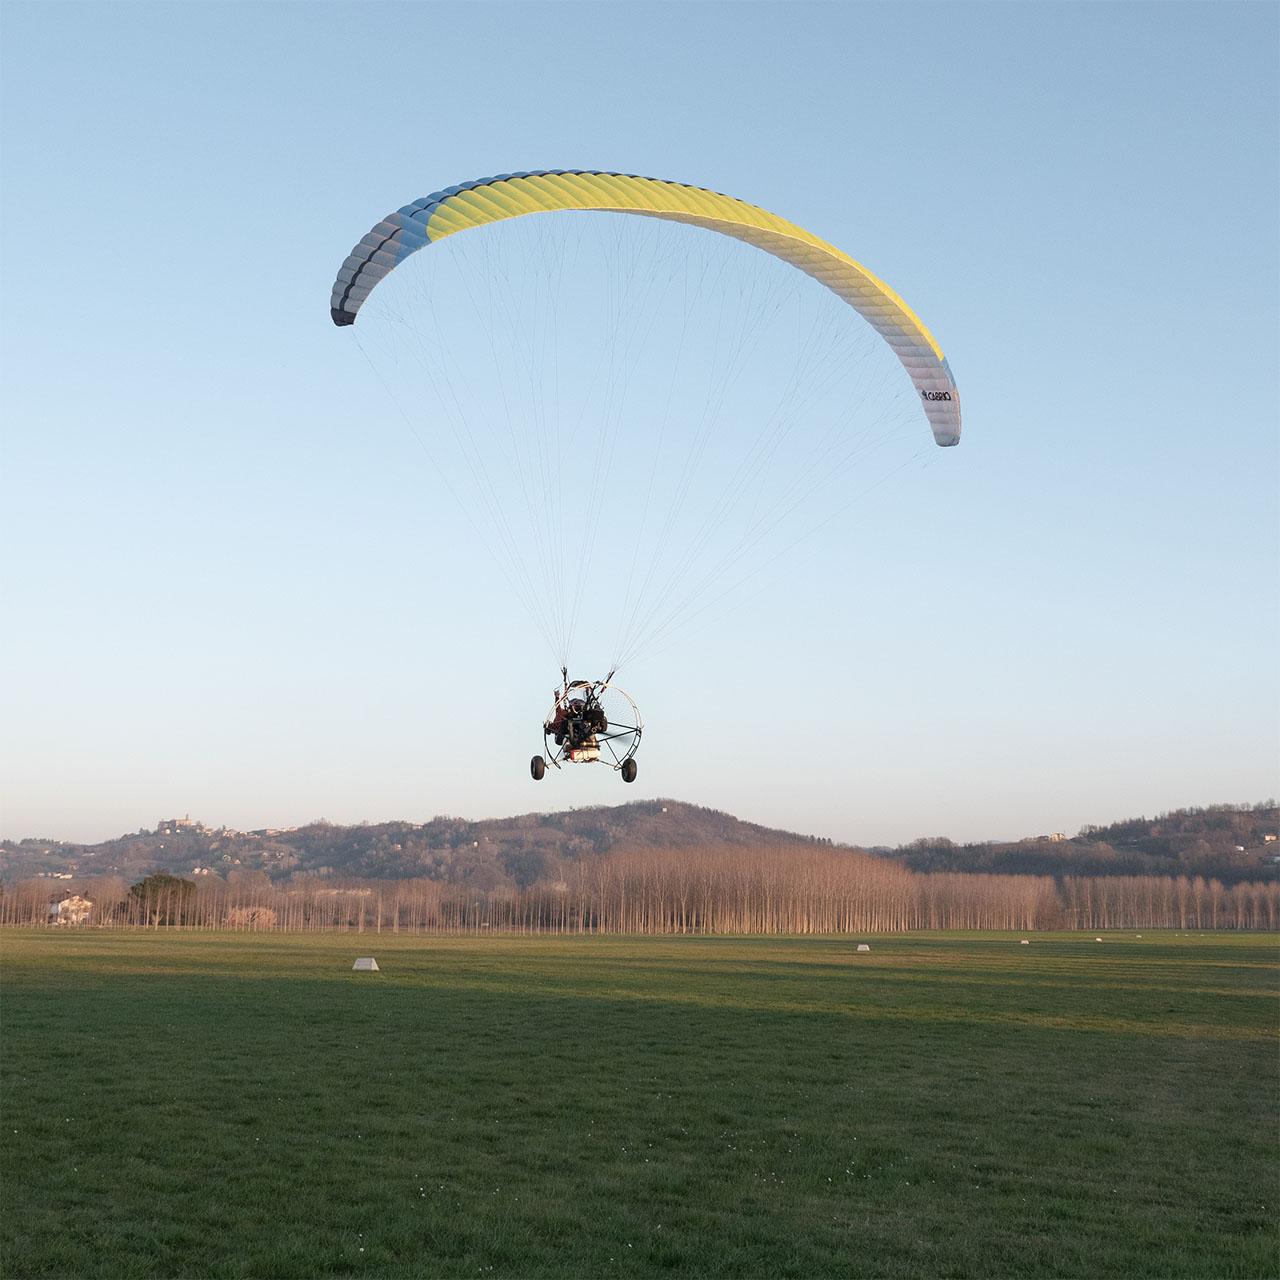 aeroclub-paracarrello-albatros-acqui-terme-paracarrello-slide45